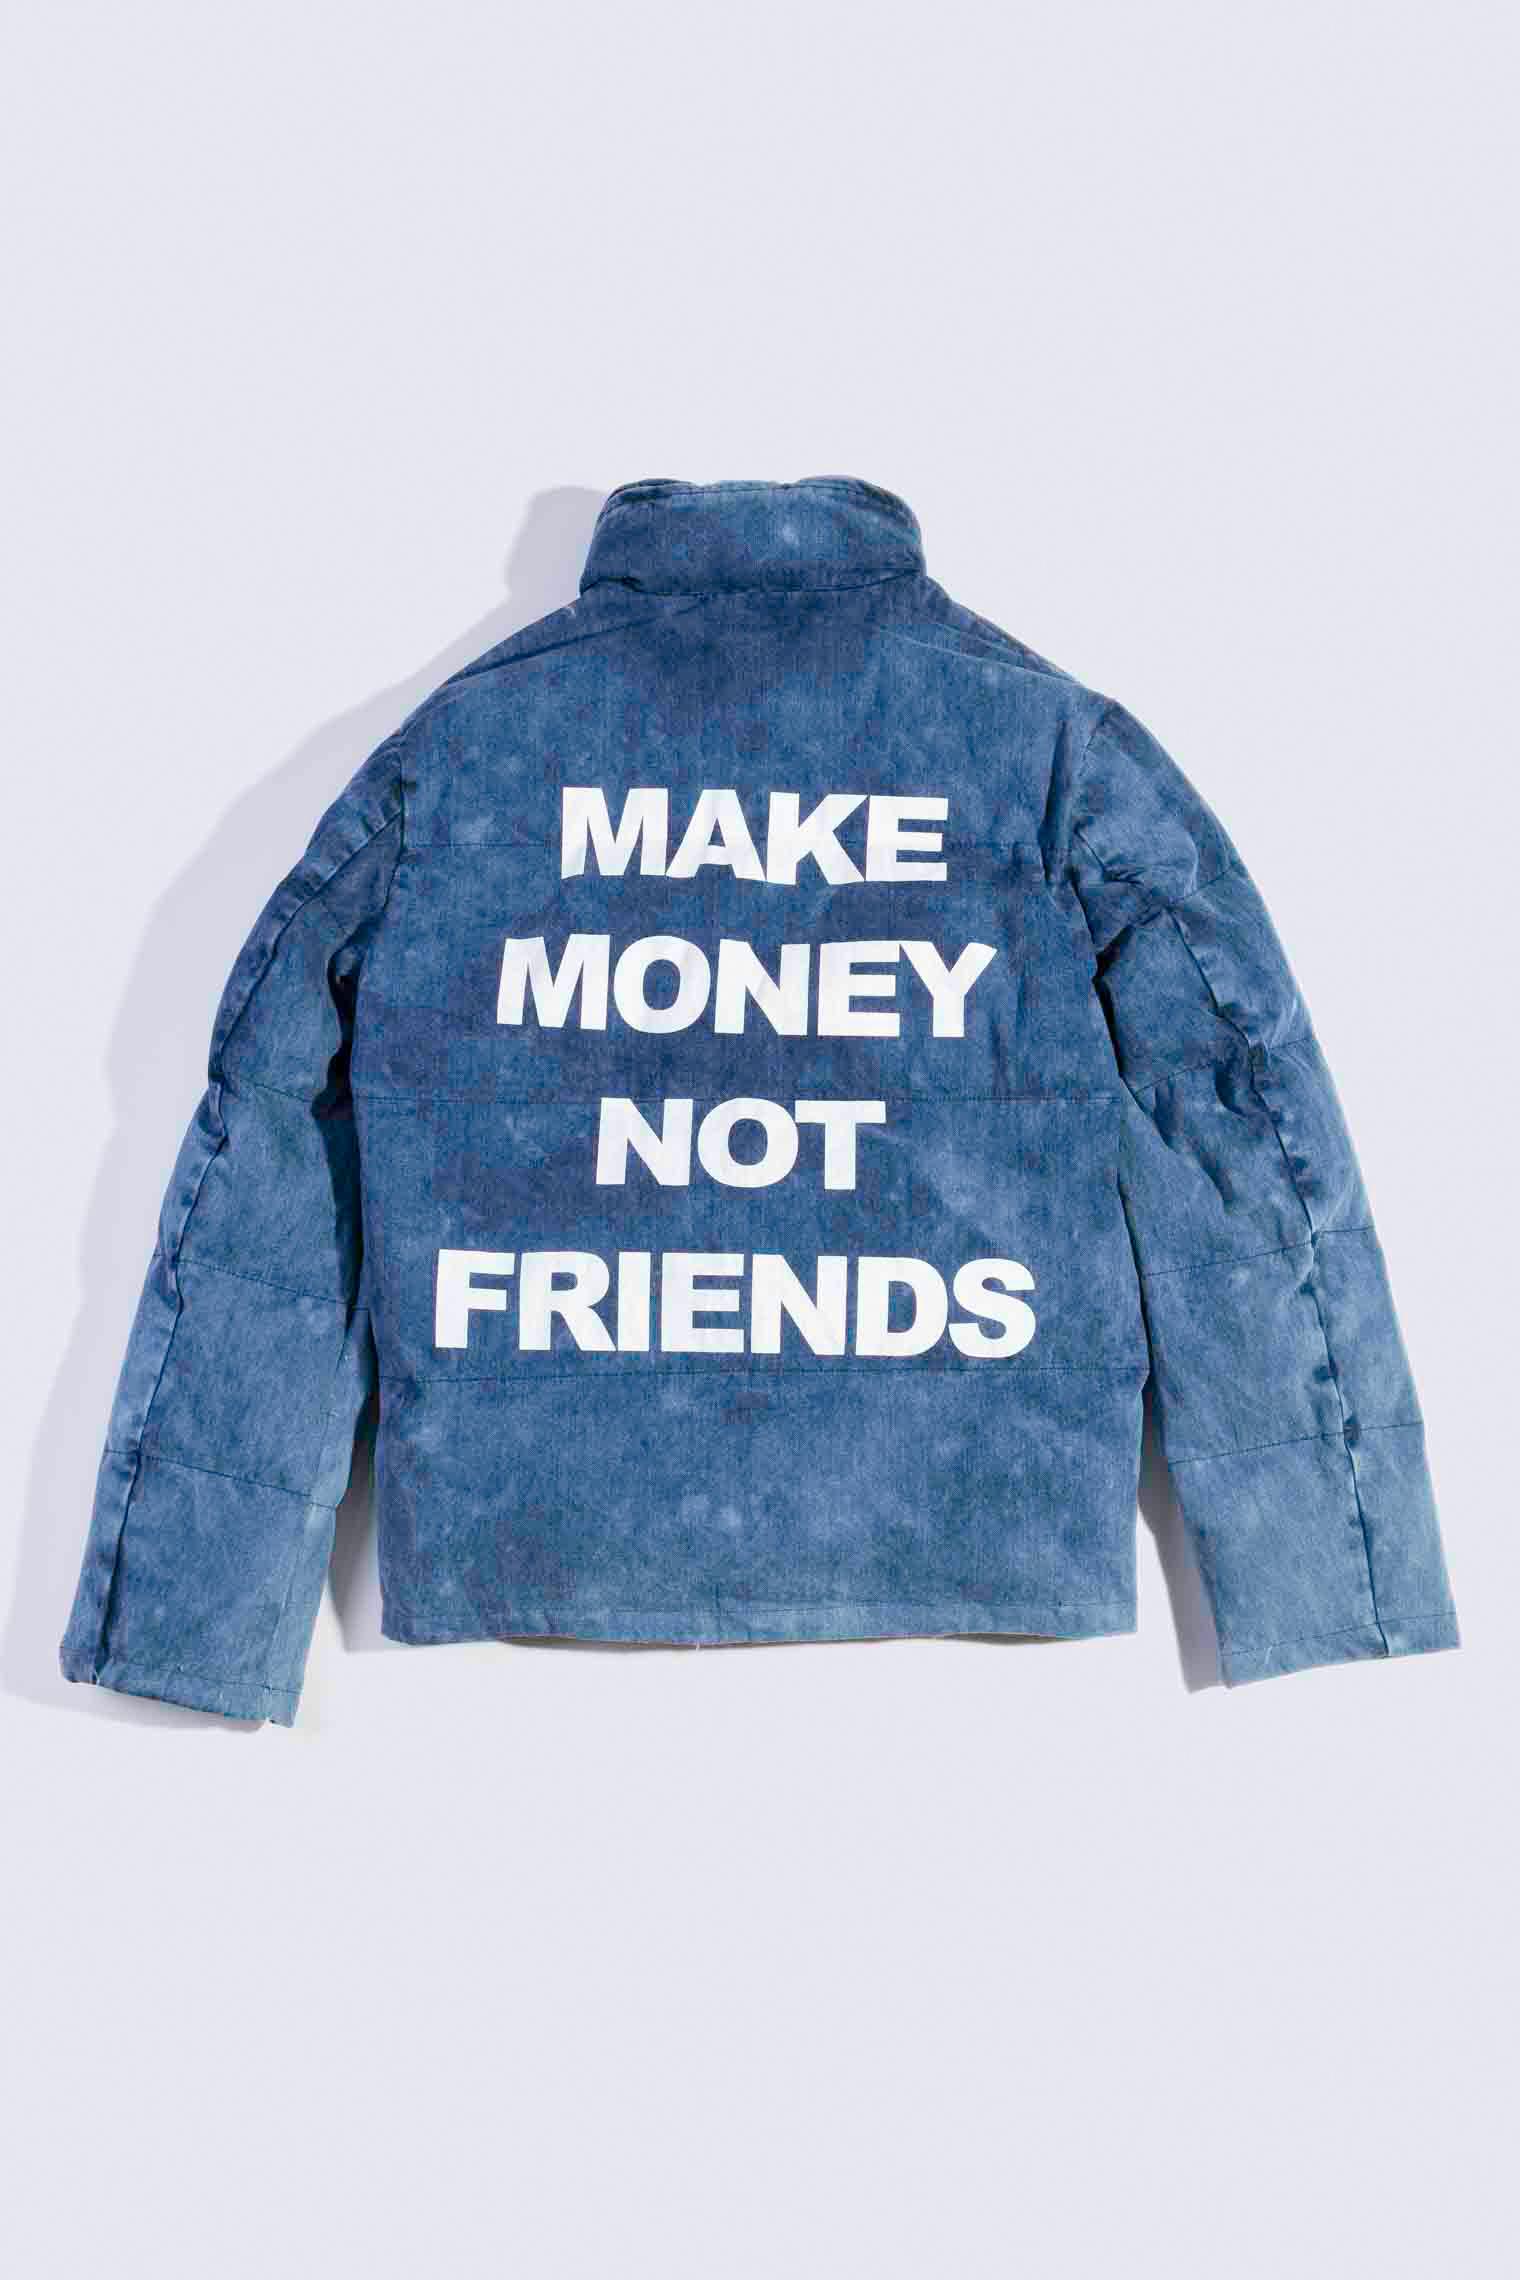 MAKE MONEY NOT FRIENDS GIUBBINO JEANS MU1108